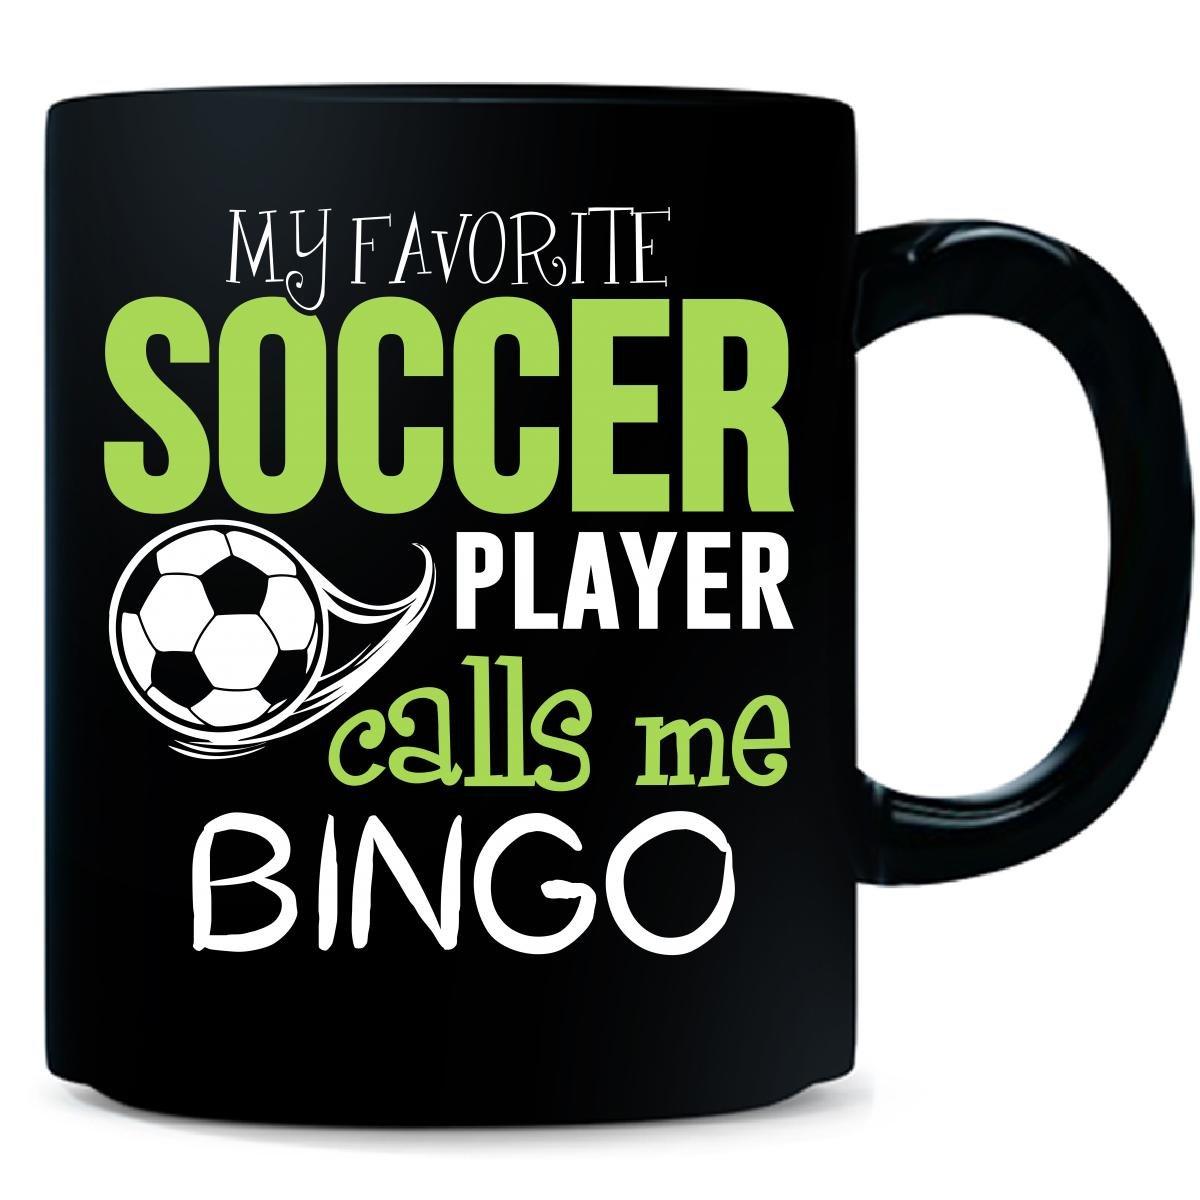 My Favorite Soccer Player Calls Me Bingo - Mug by My Family Tee